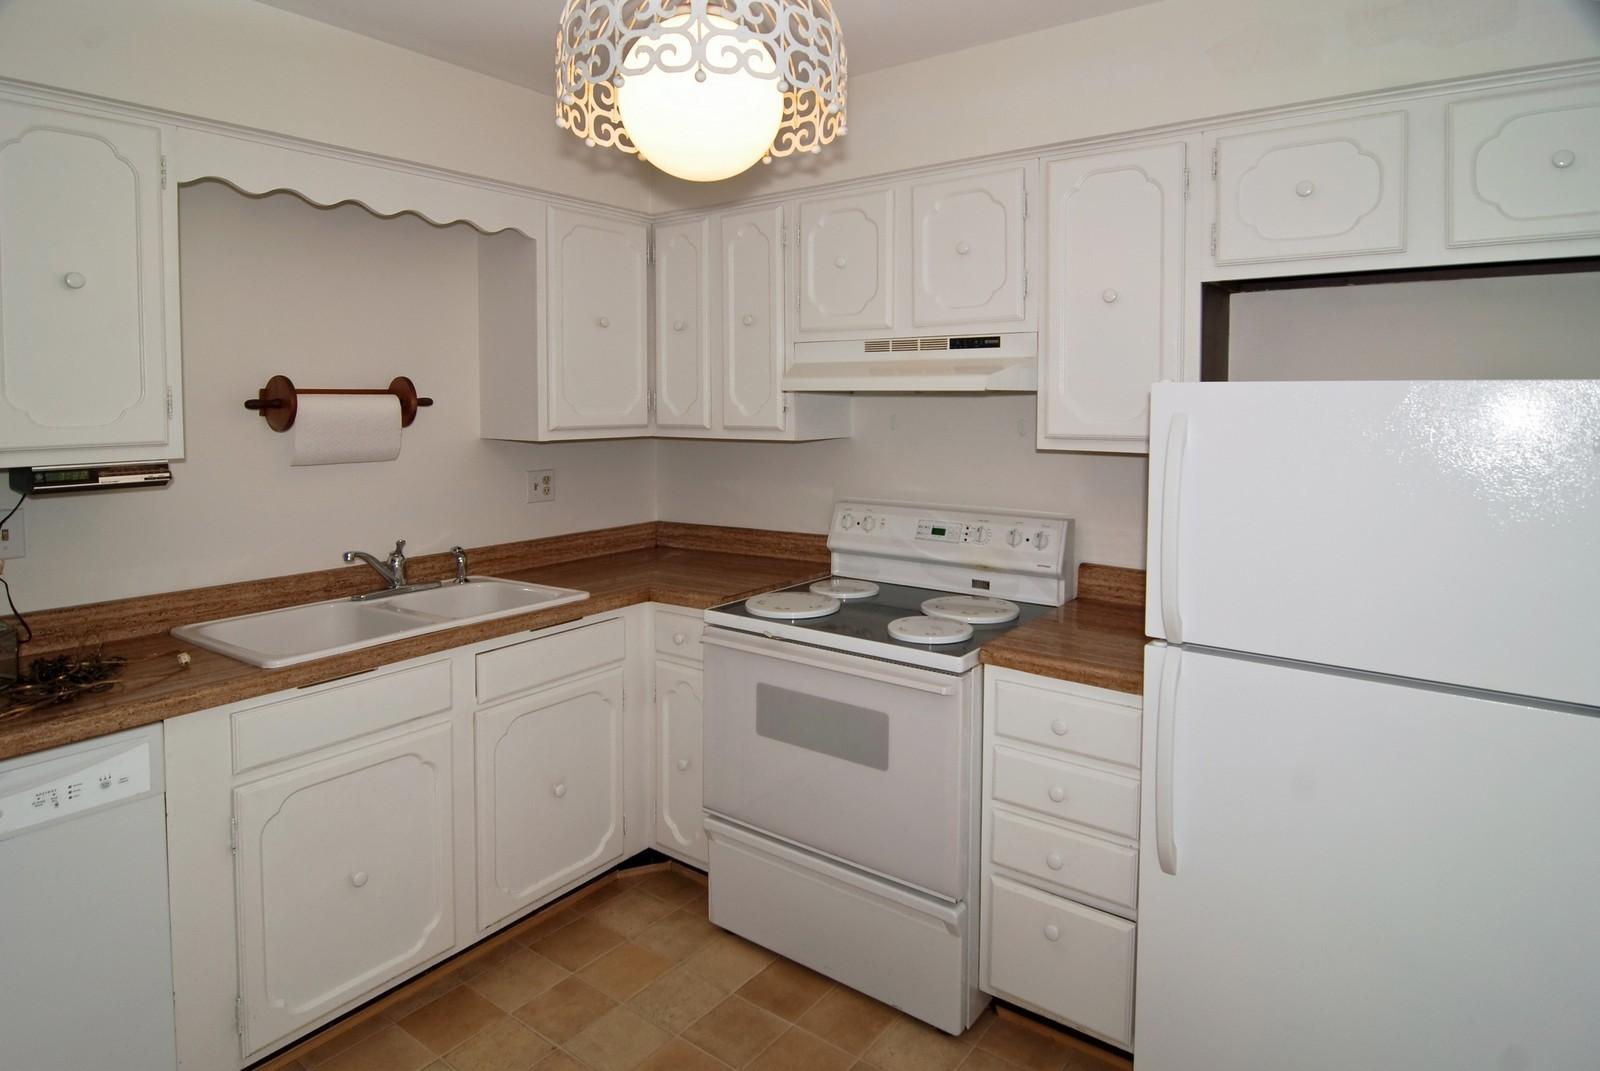 Real Estate Photography - 7904 W North Ave, Unit 303E, Elmwood Park, IL, 60707 - Kitchen